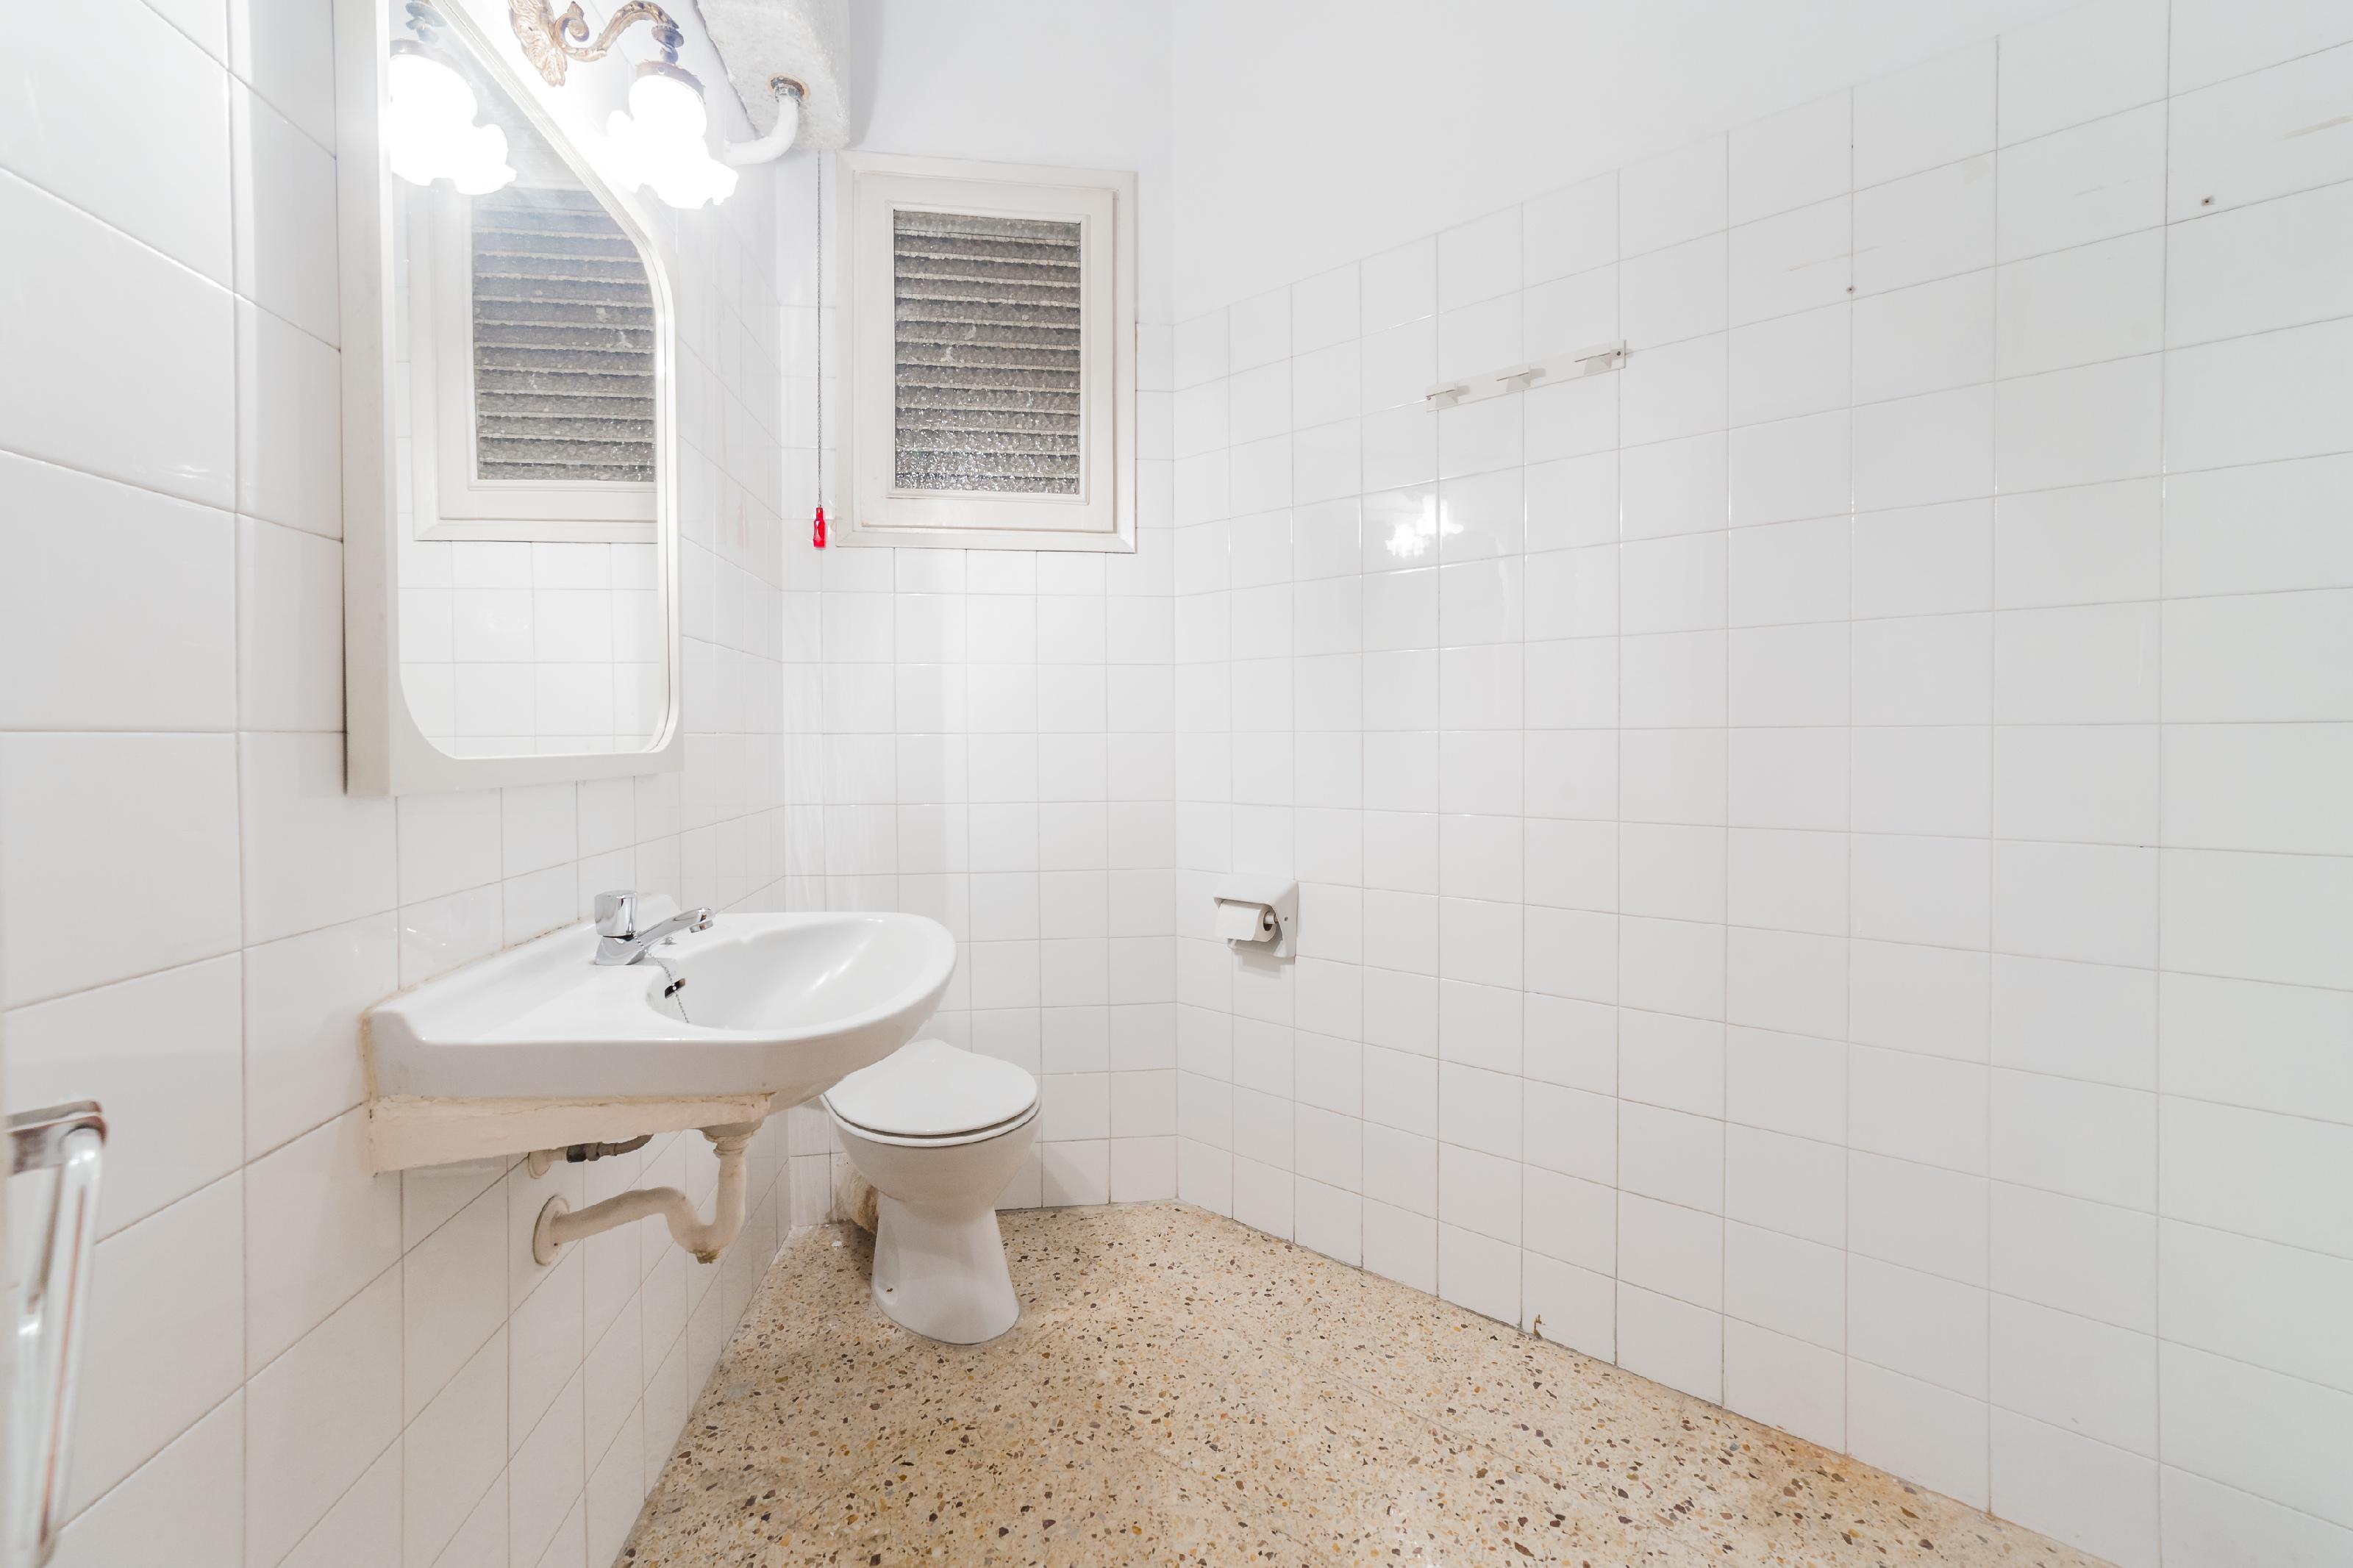 247624 Flat for sale in Eixample, Sant Antoni 25